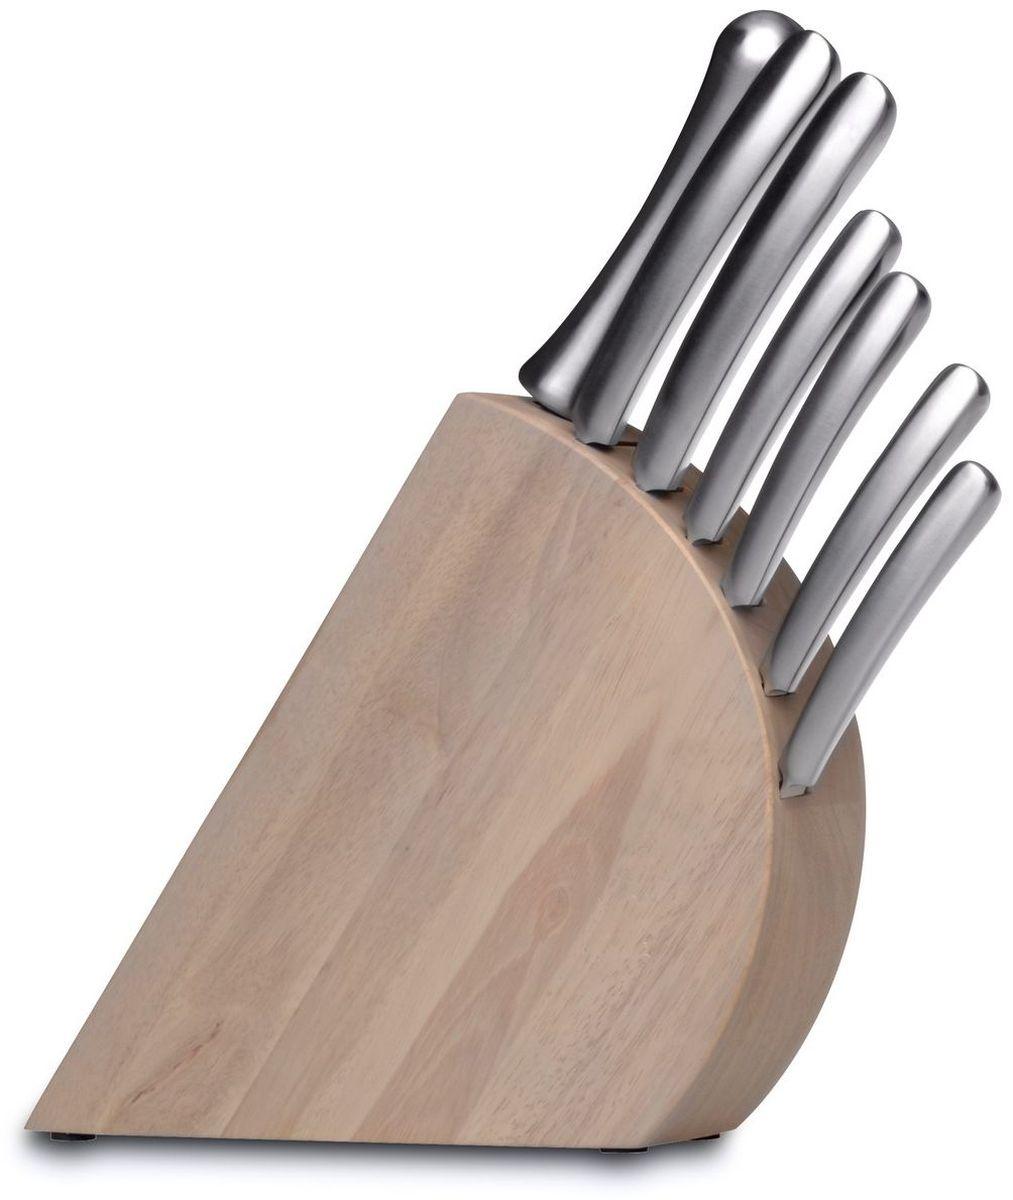 Набор ножей BergHOFF Concavo, 8 предметов набор ножей berghoff forget new 1307145